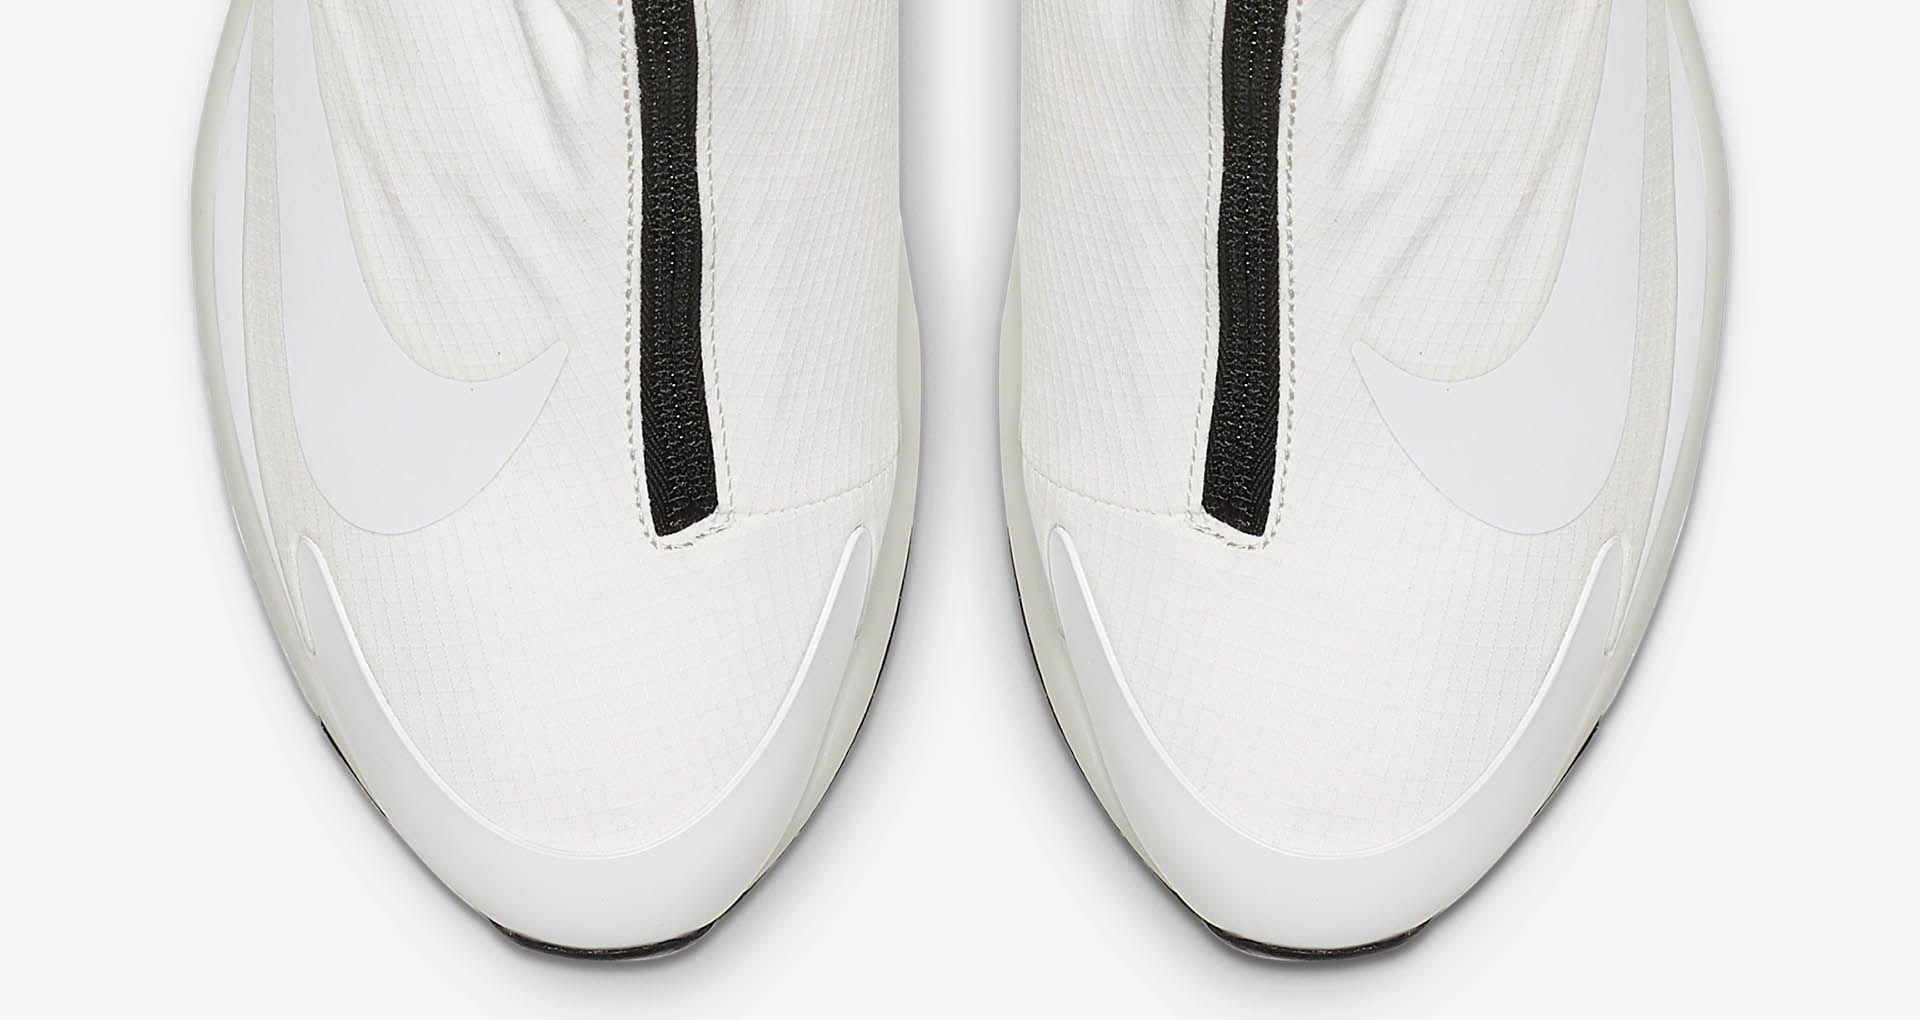 Fr »NikeLaunch Air Hi « La Sortie Ambush® Max 180 Date Nike De PkX0O8nw